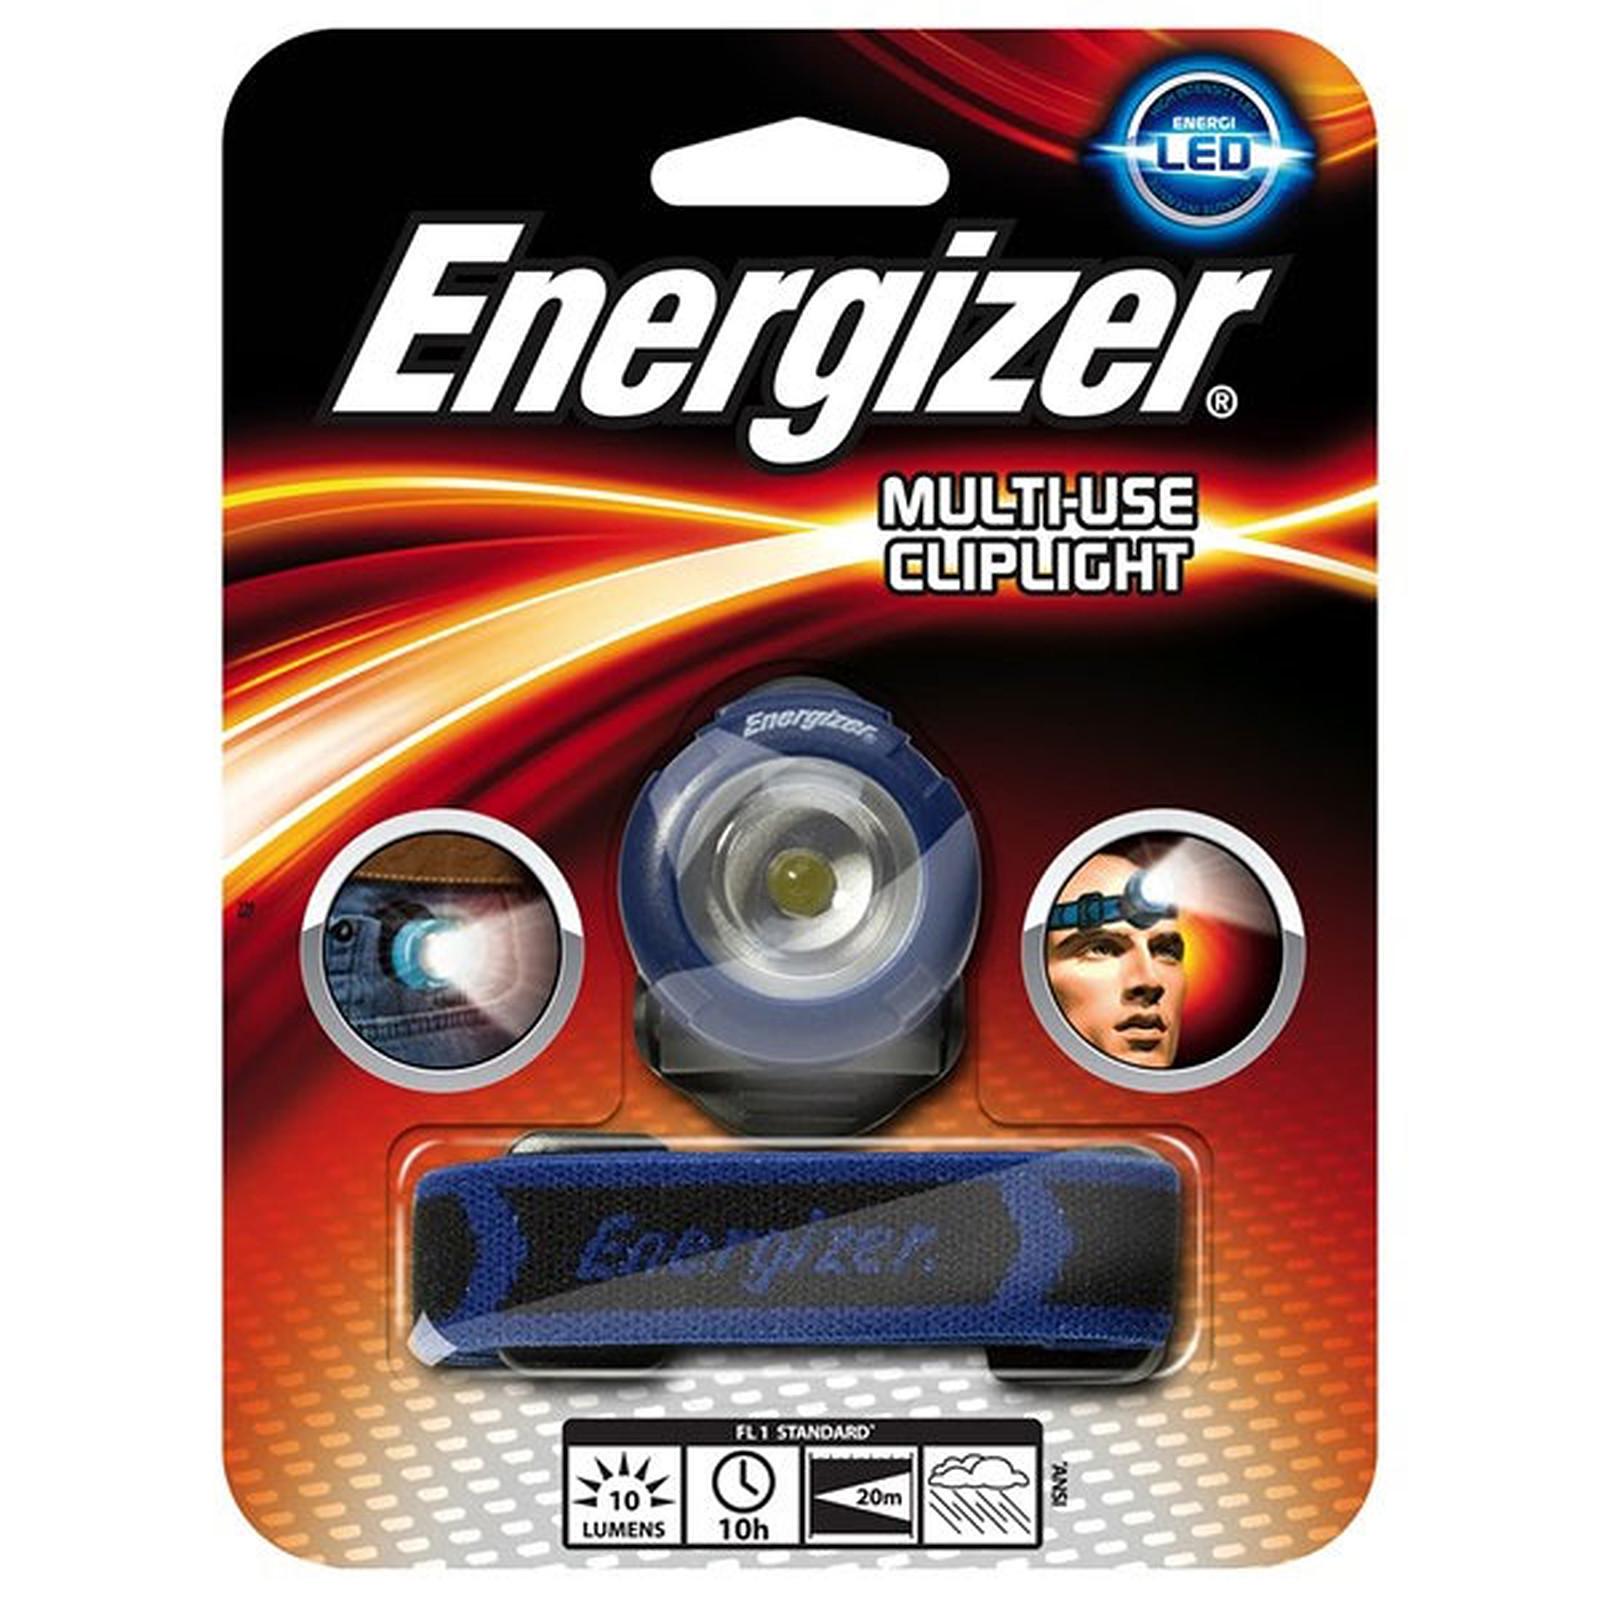 Energizer Multi-use Cliplight